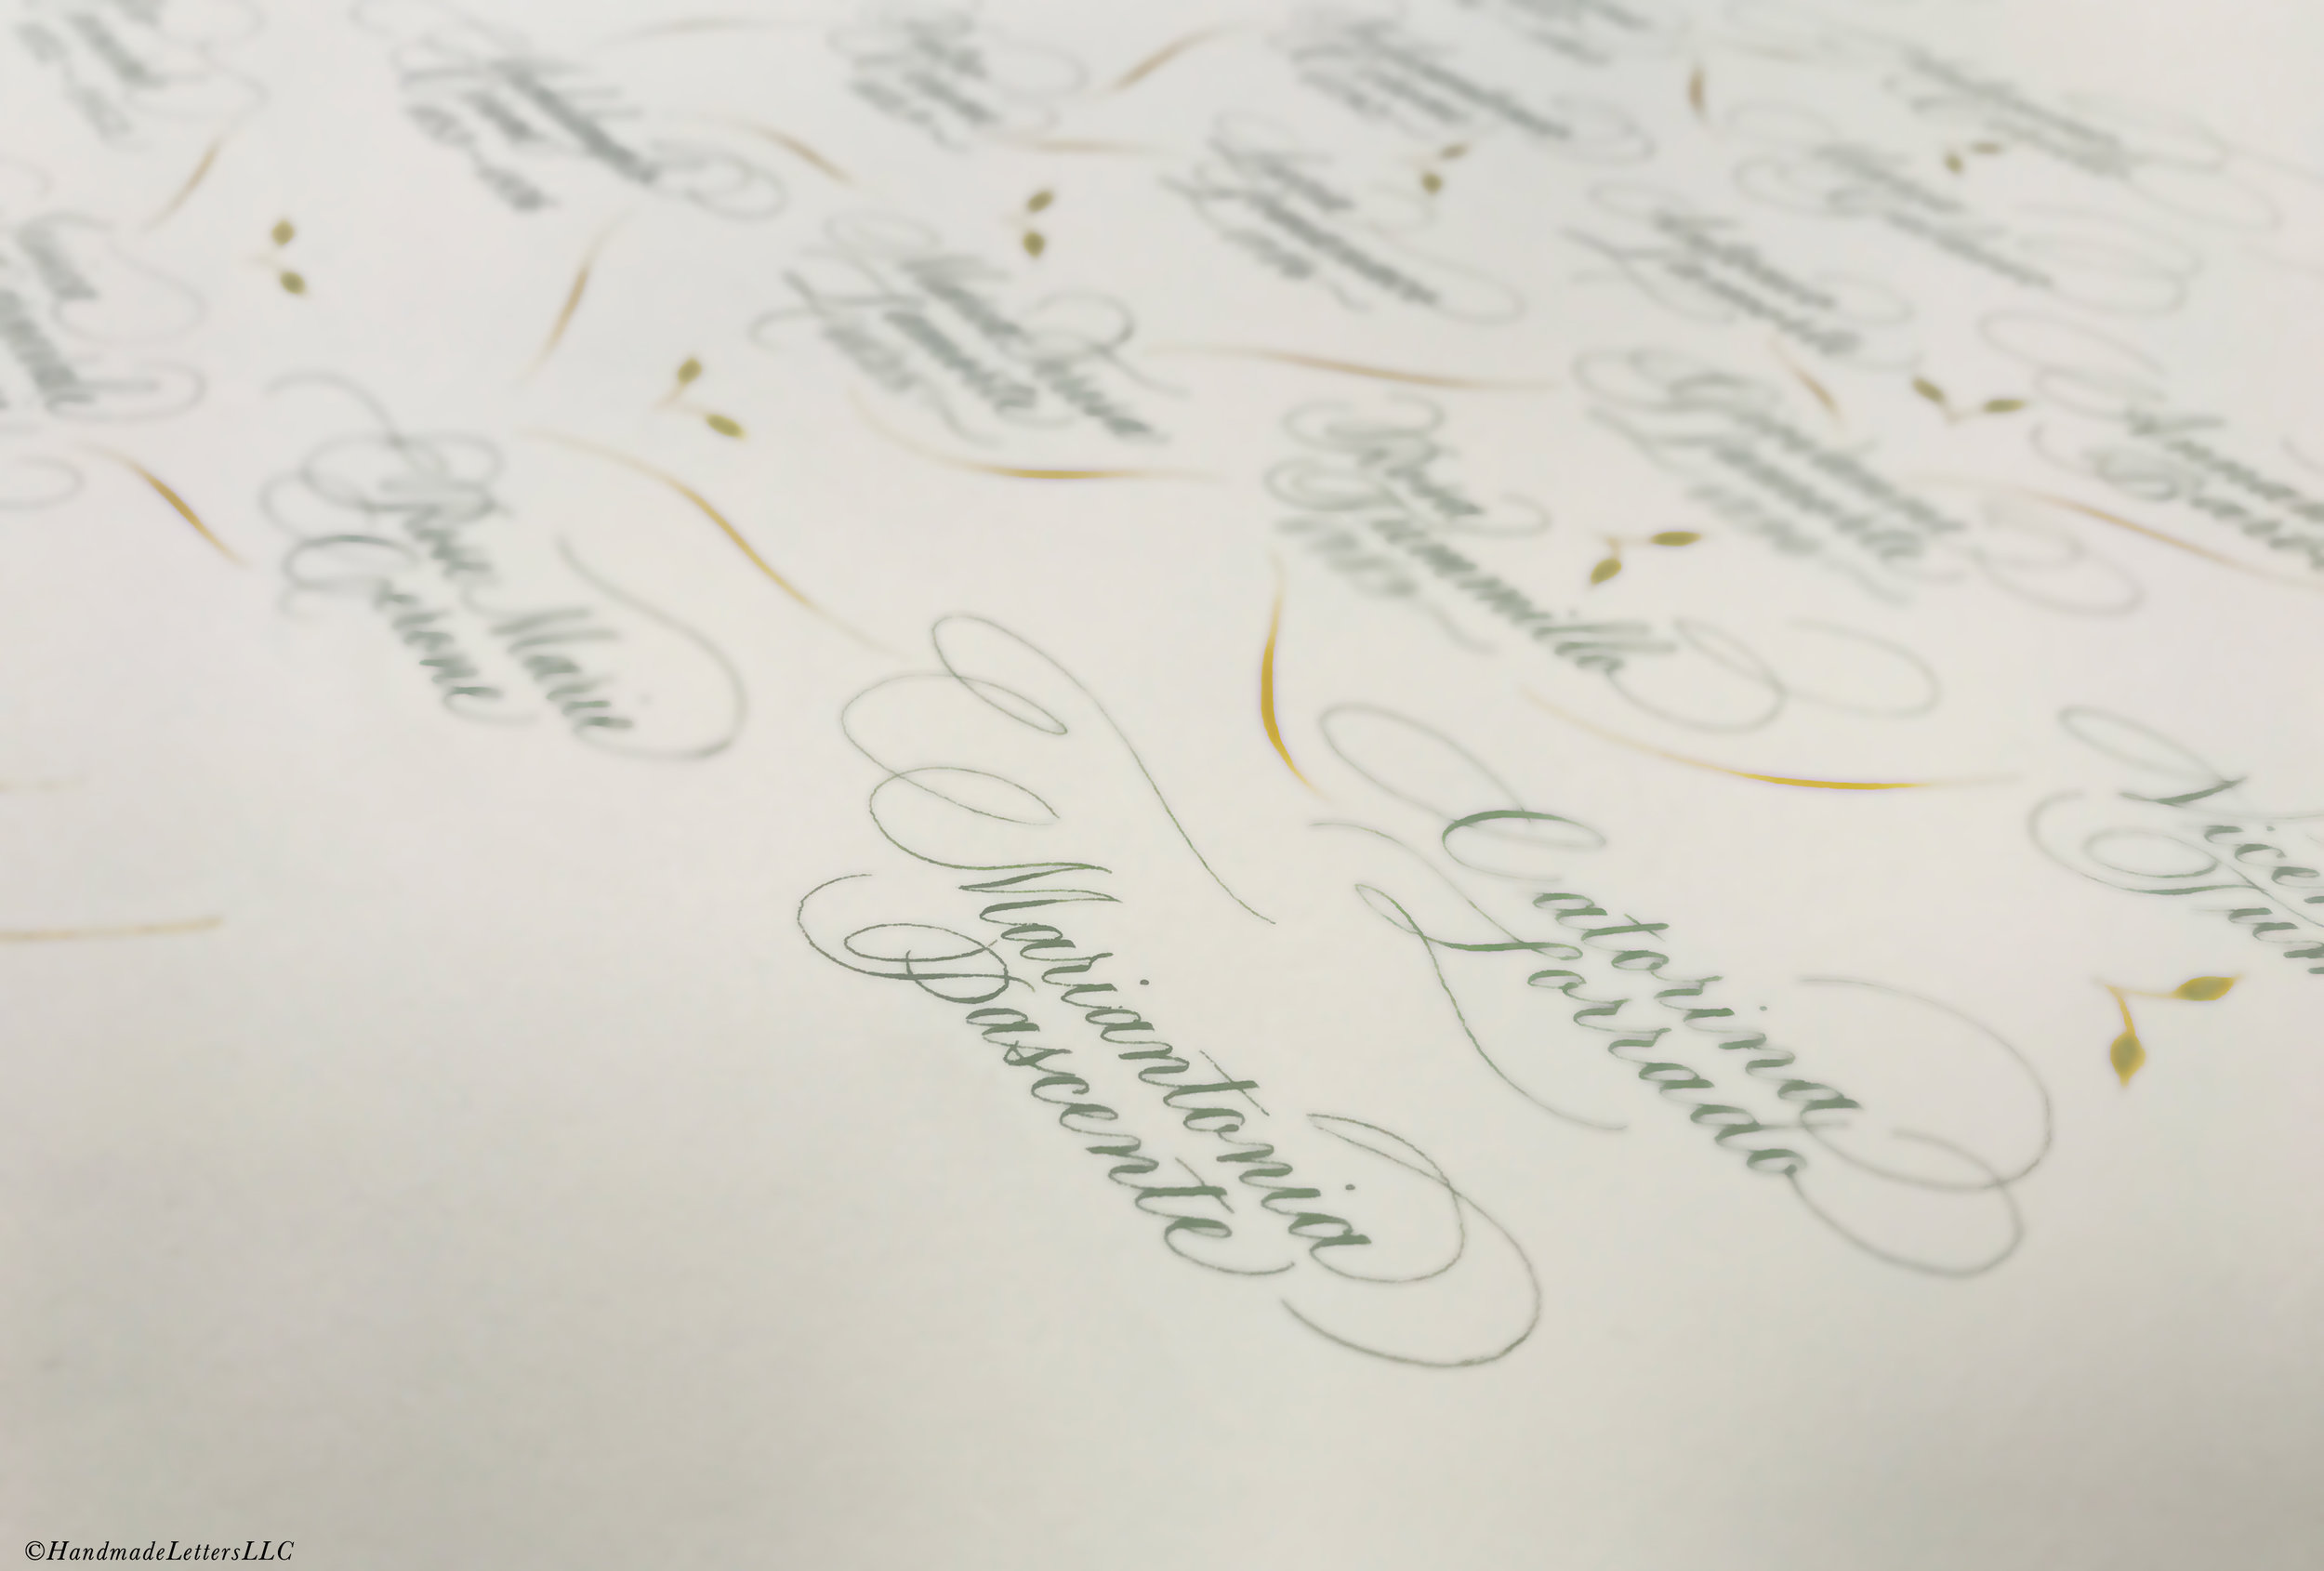 Handmade Letters - Modern Genealogy Tree